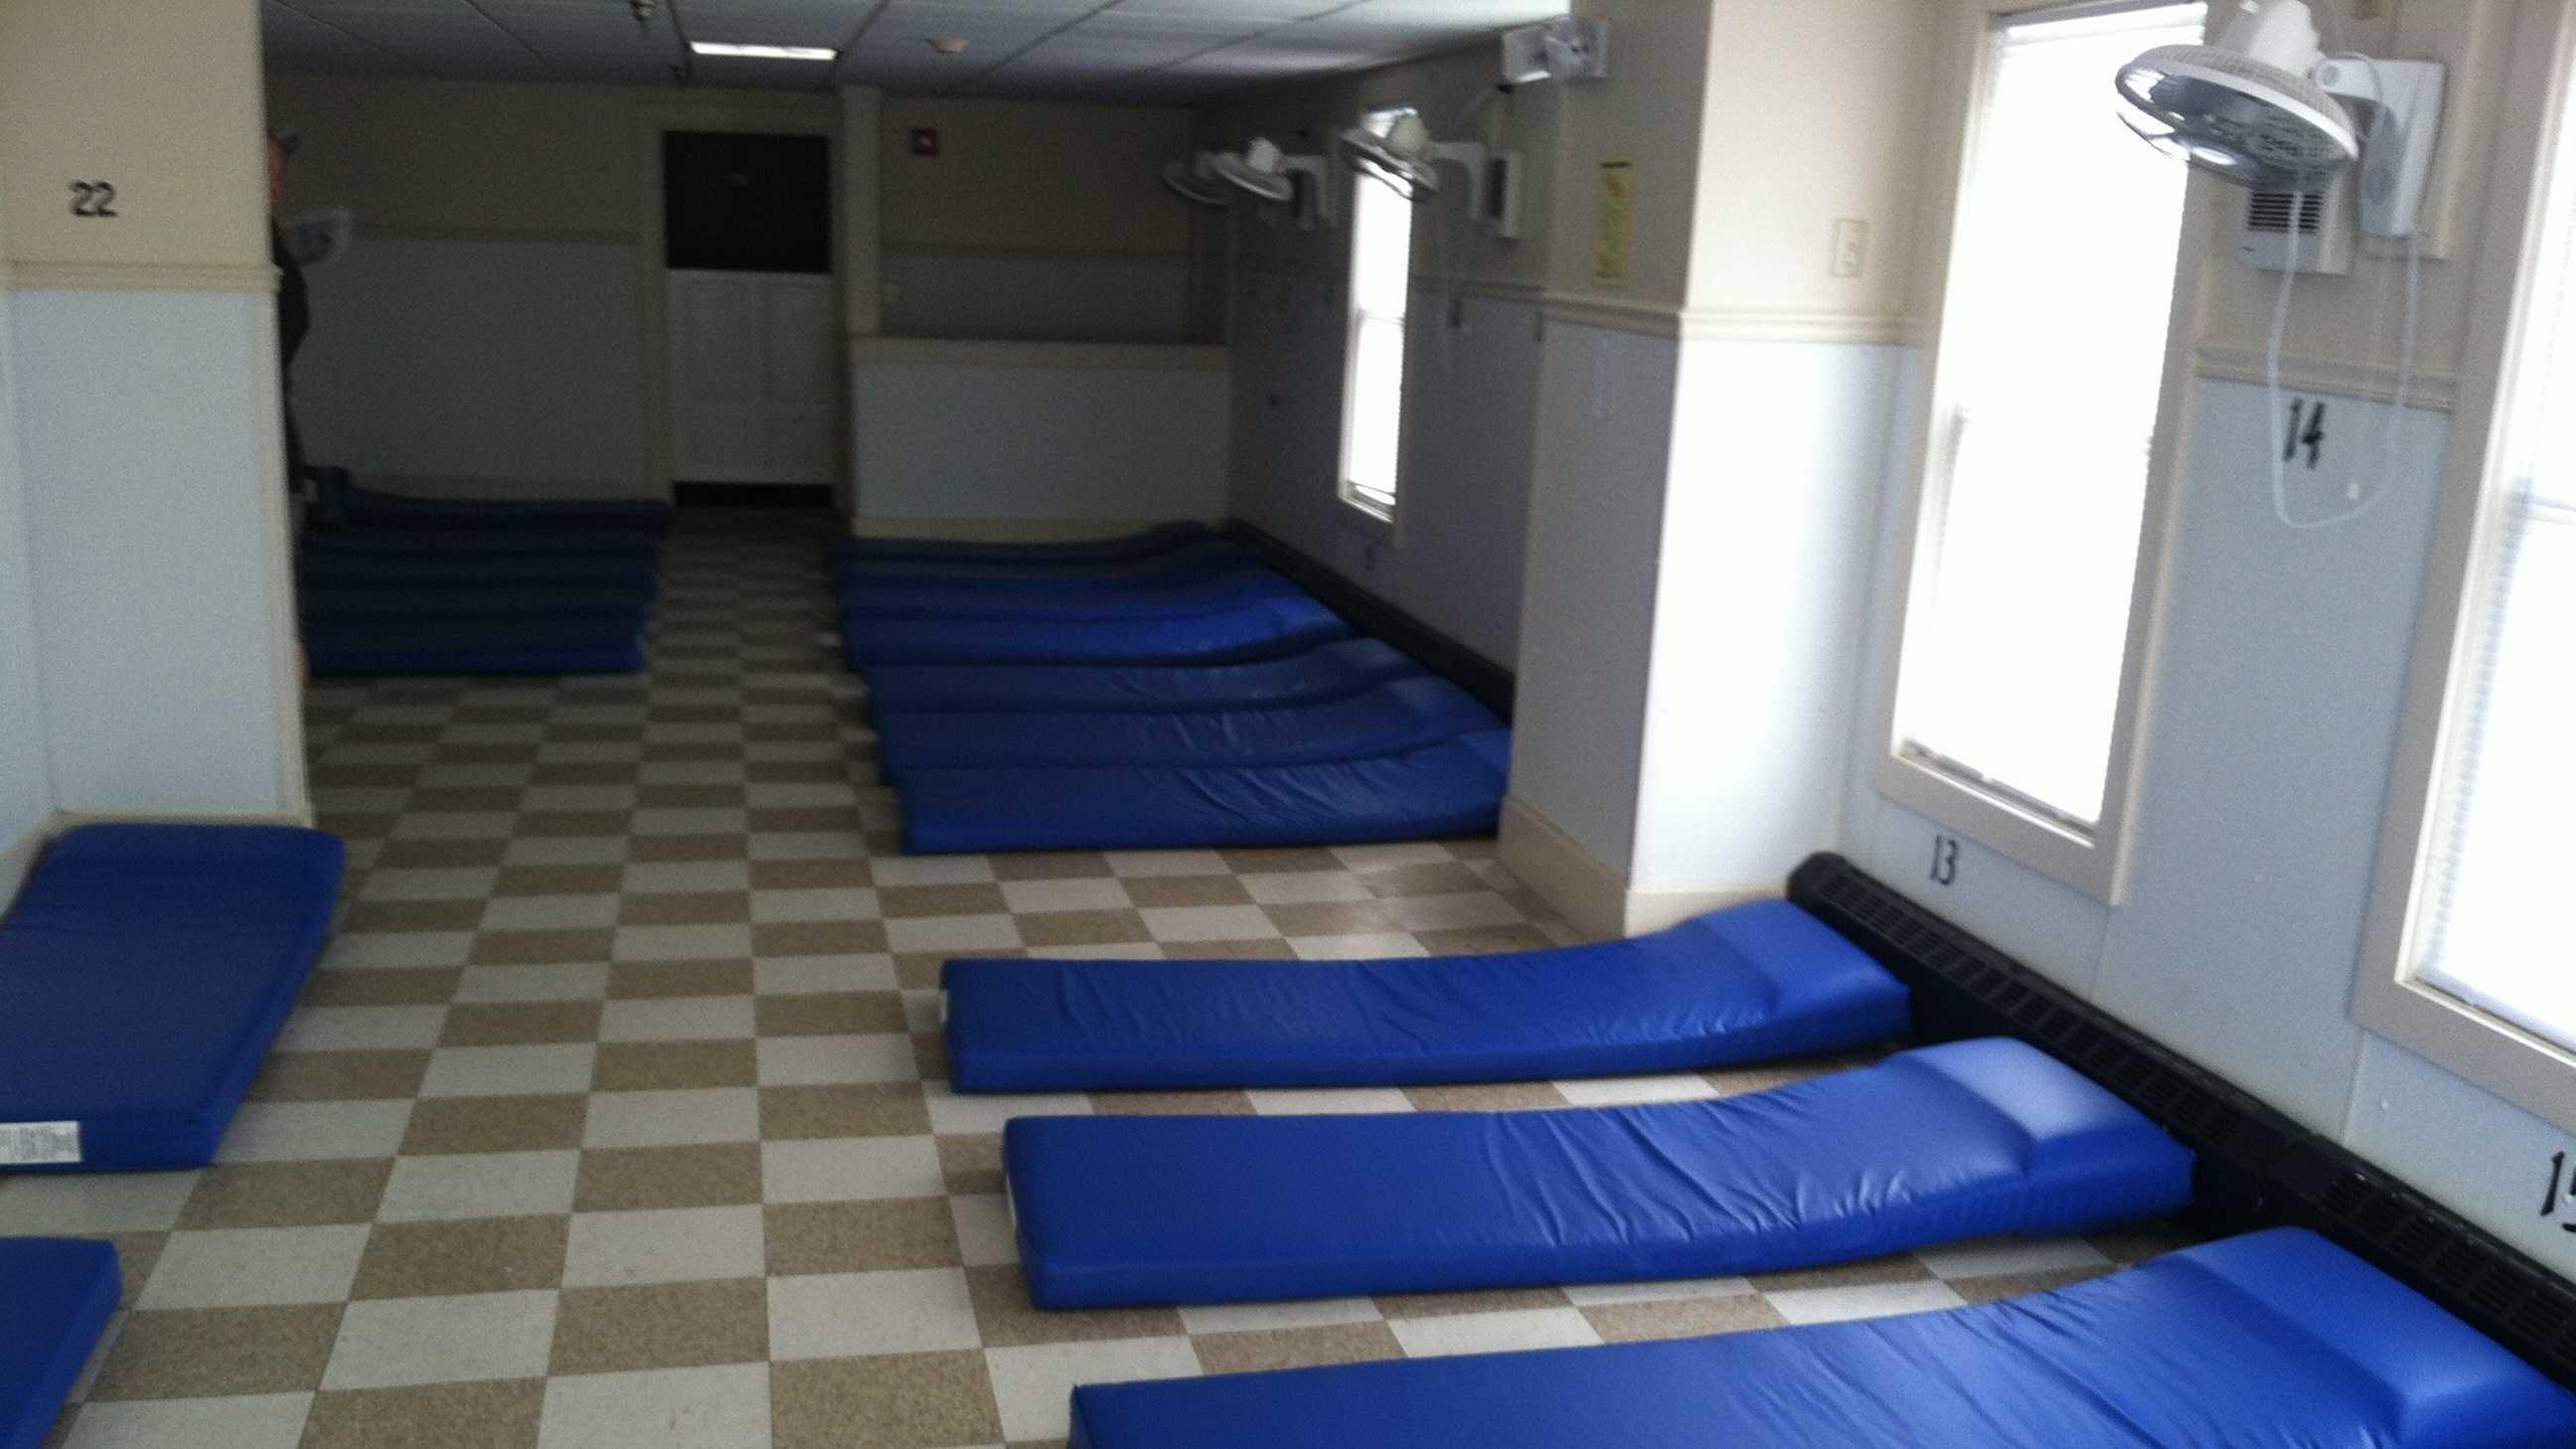 Oxford Street Shelter